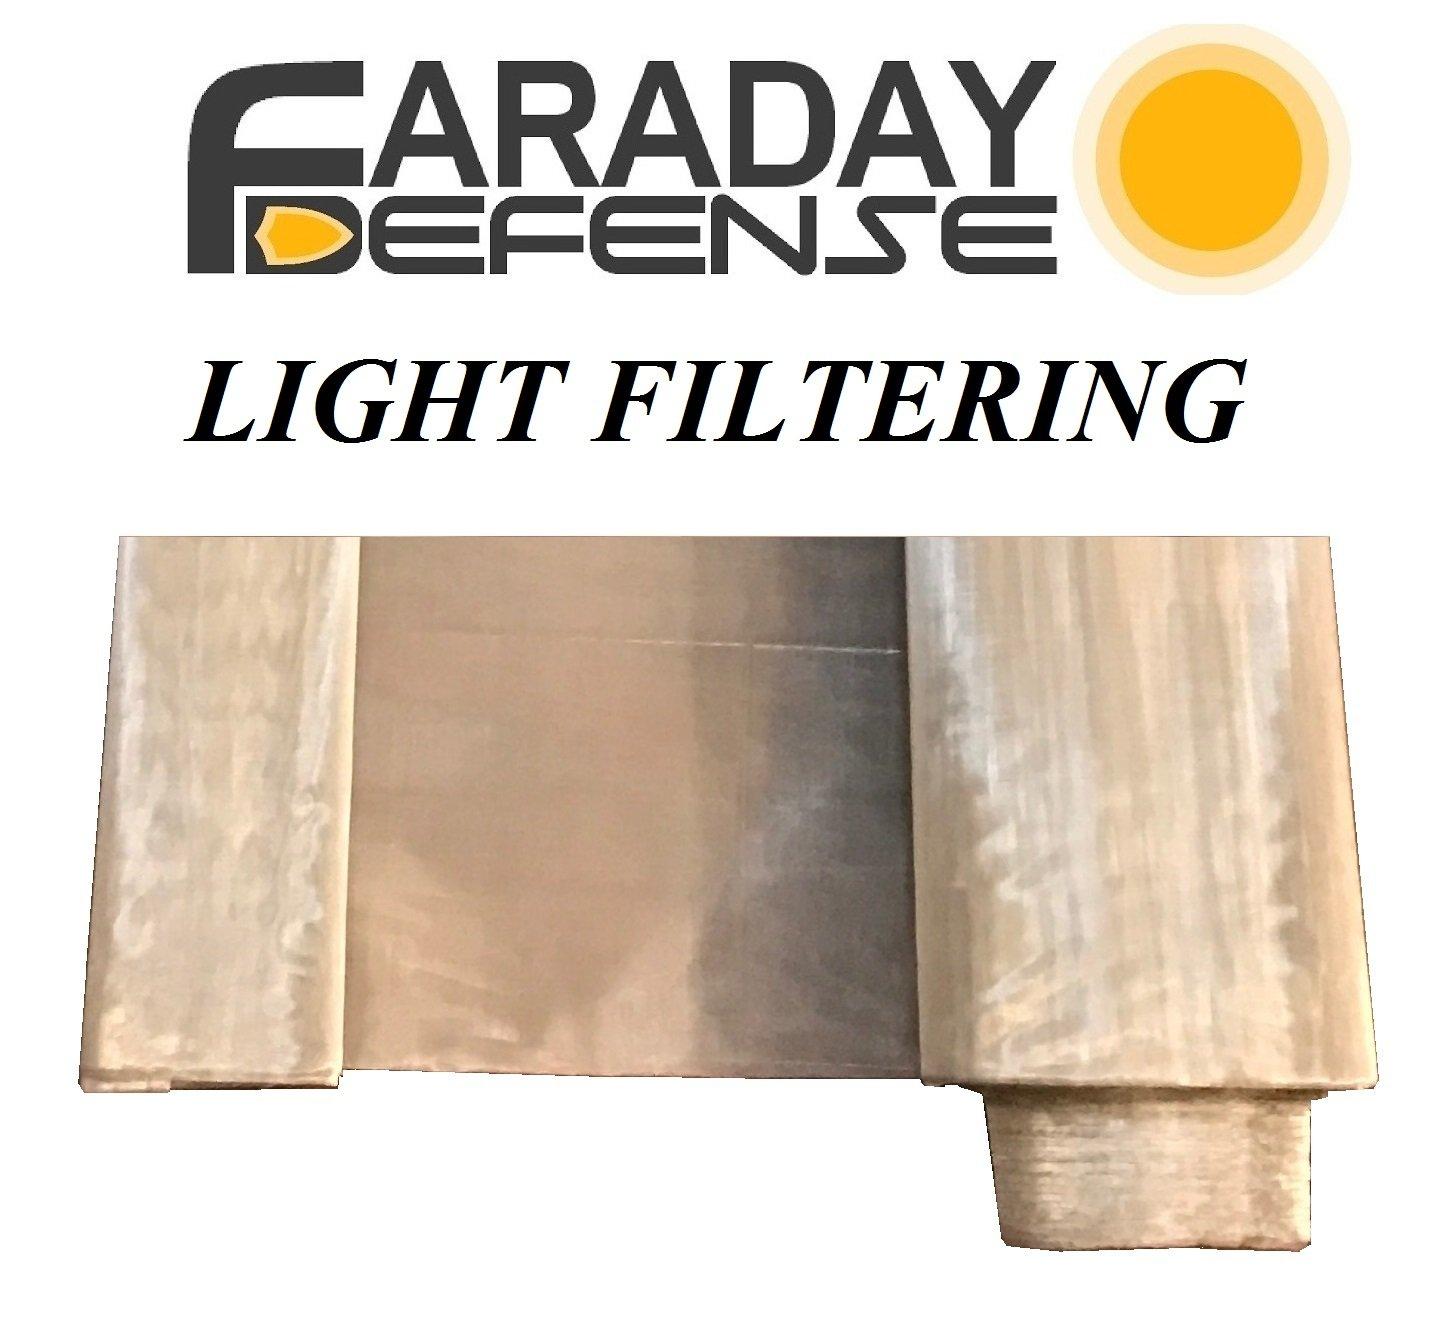 RF RFID EMF Light Filtering Fabric Mesh 50' x 1' Signal Blocking Material Faraday Defense